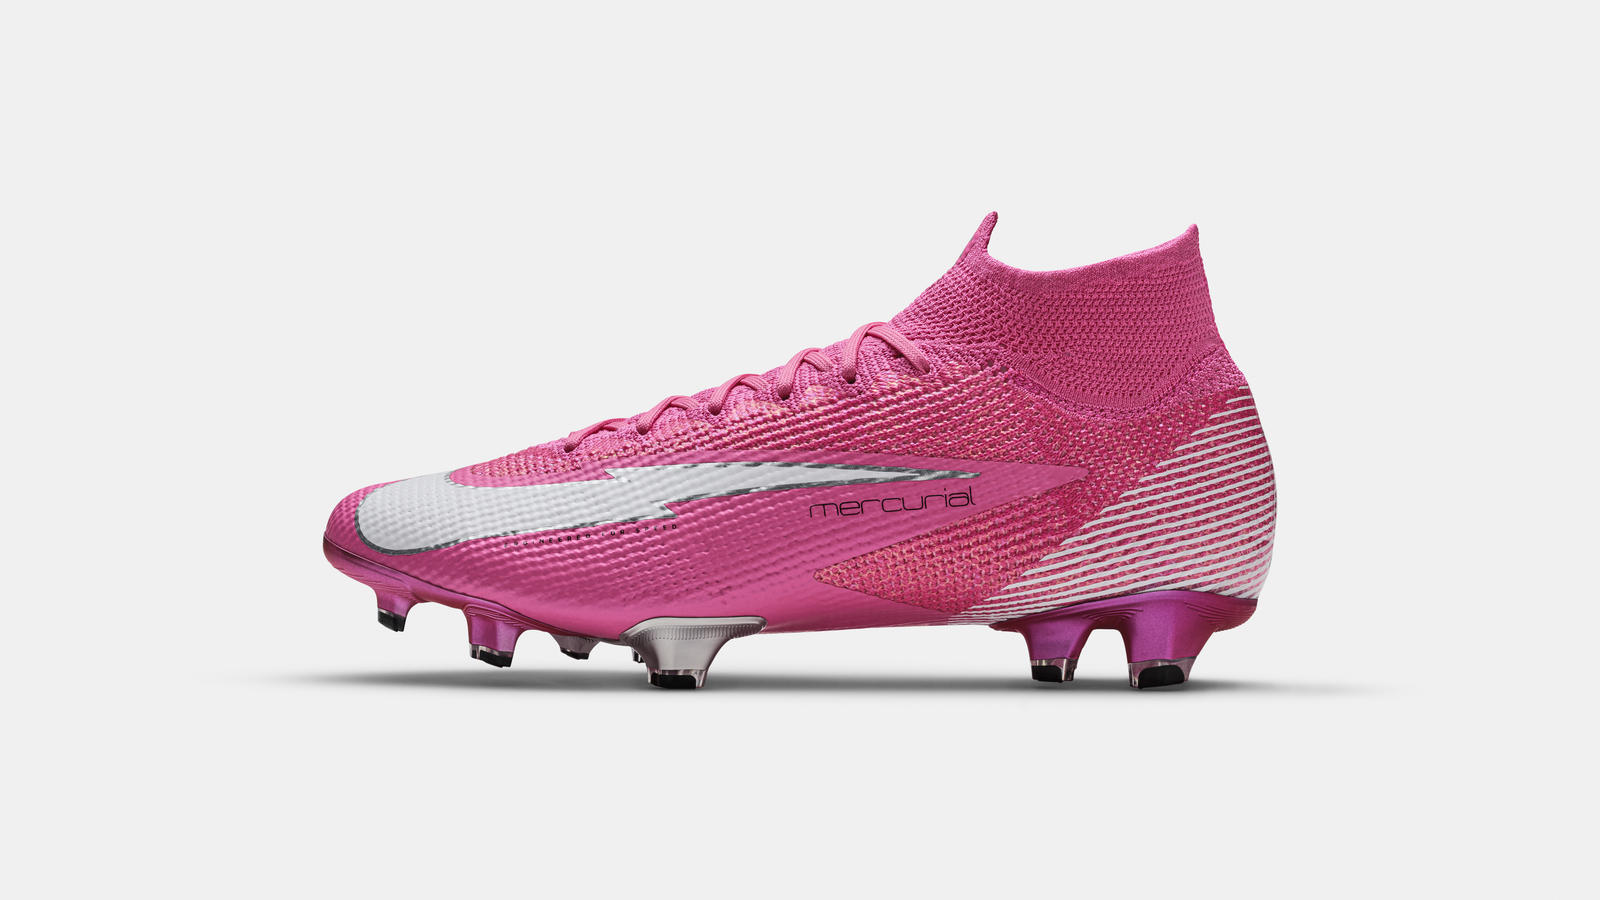 Nike Mercurial Superfly Mbappé Rosa